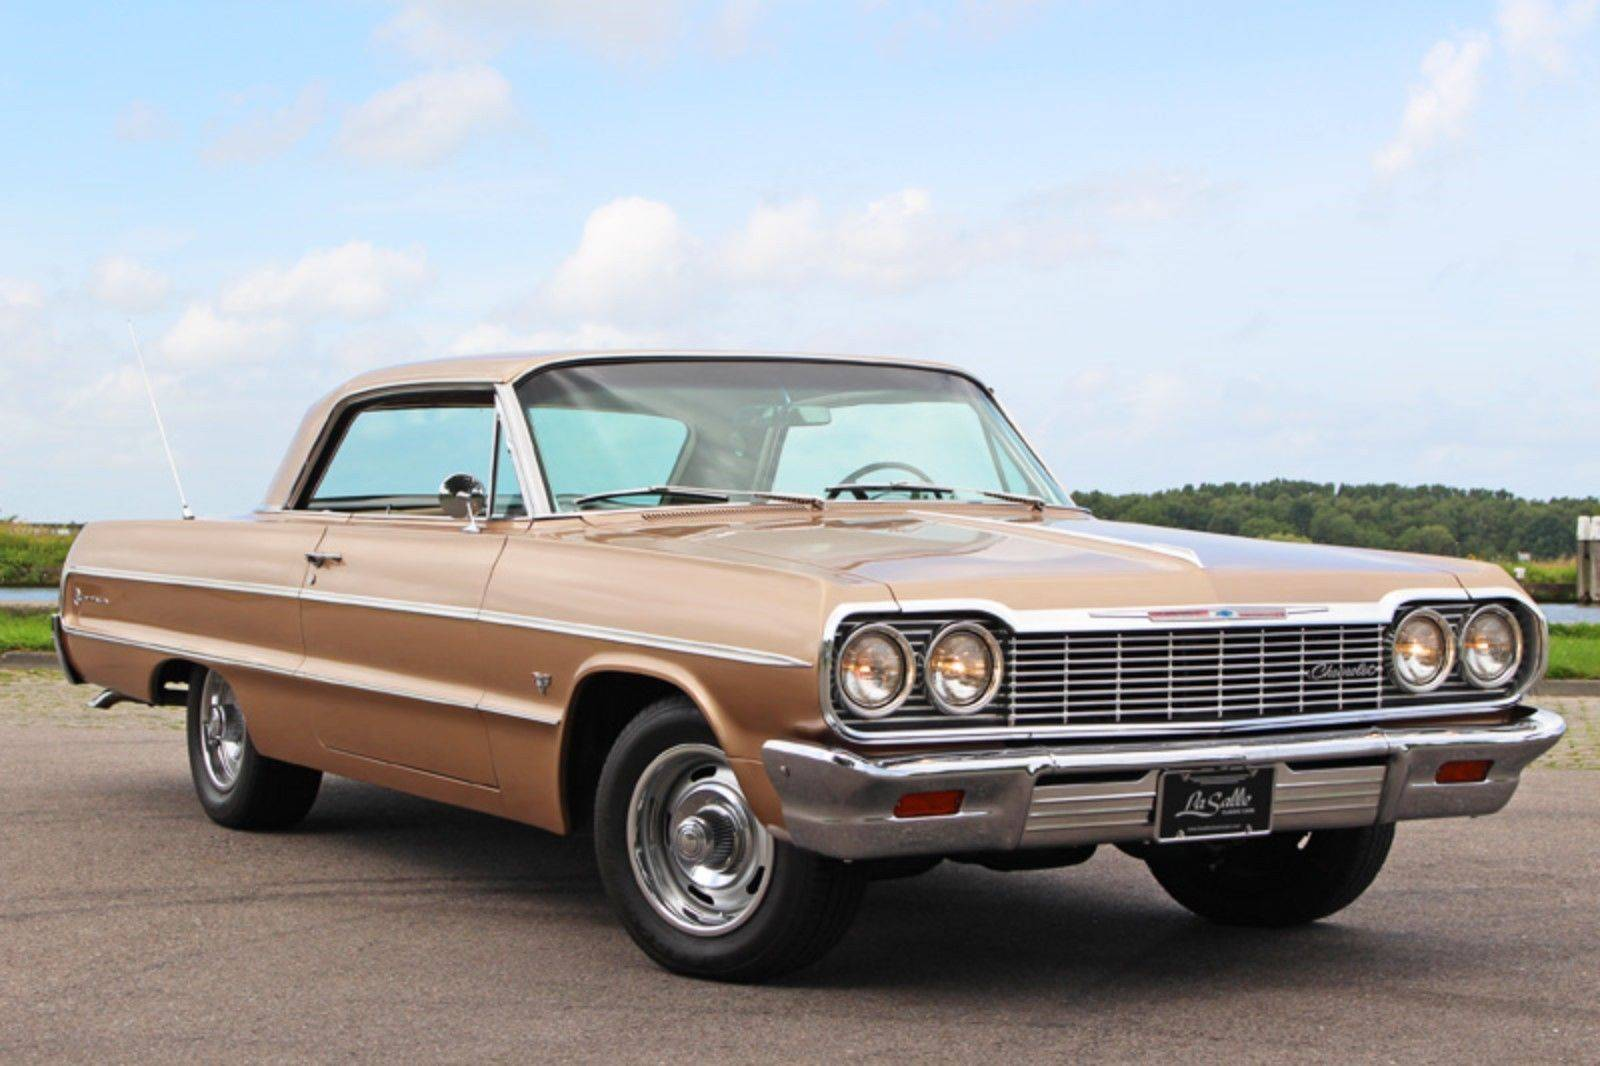 chevrolet impala sport coupe 1964 f r eur kaufen. Black Bedroom Furniture Sets. Home Design Ideas